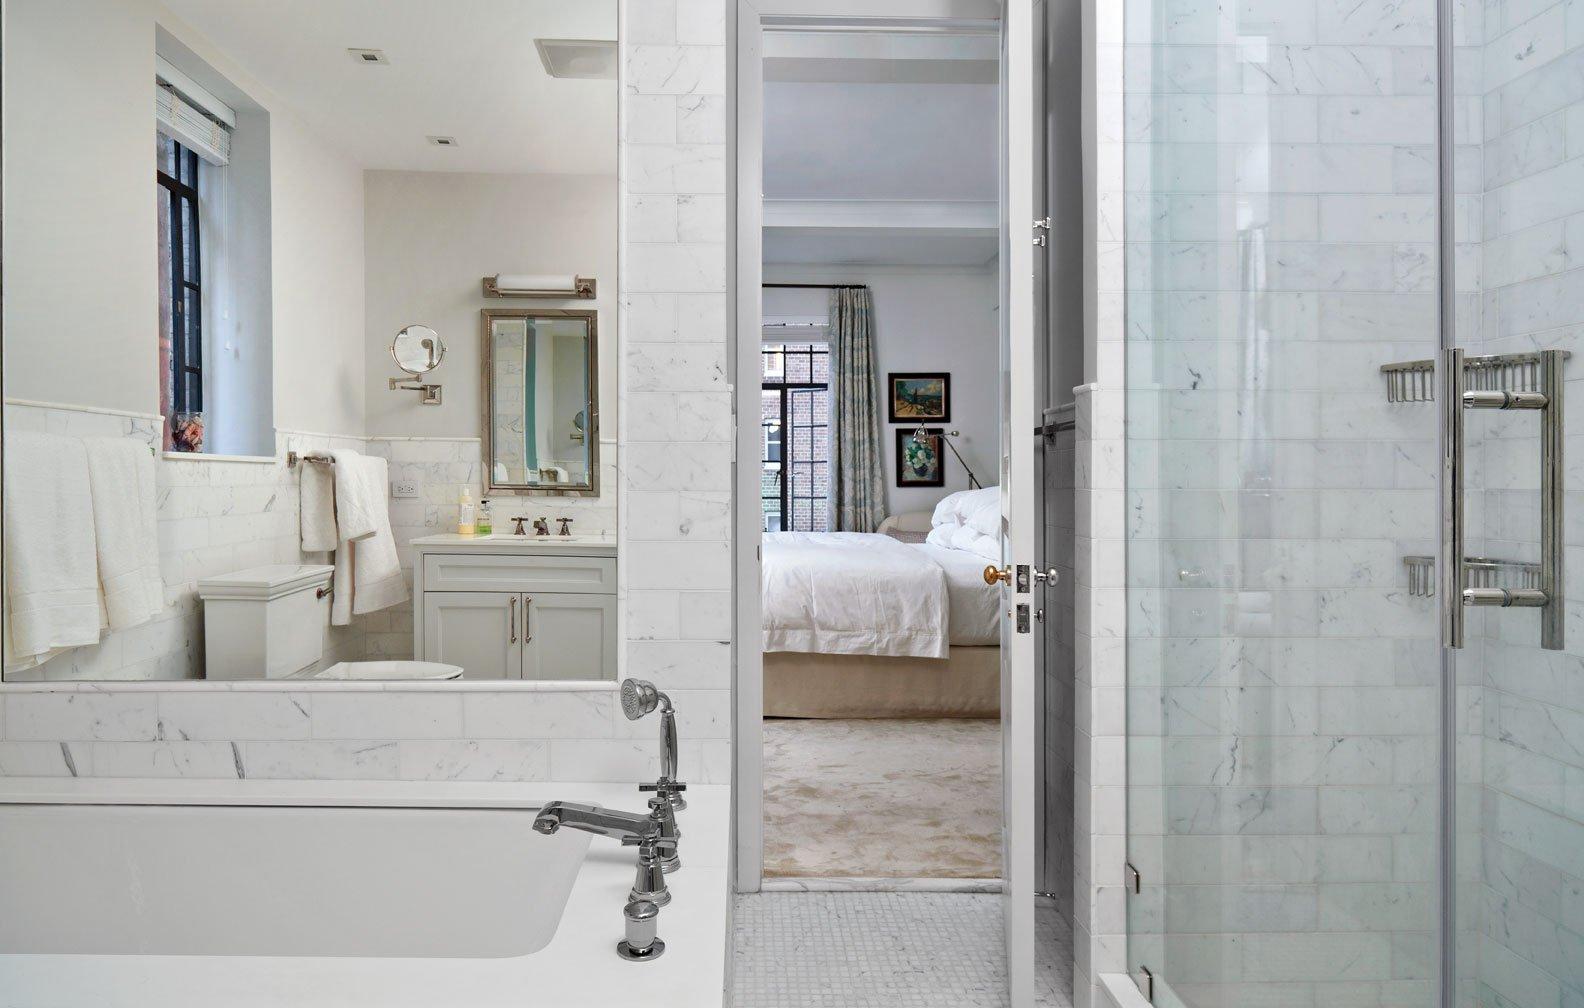 Good Bath Art Deco Apartment in the El Dorado NYC Design by Design Development NYC